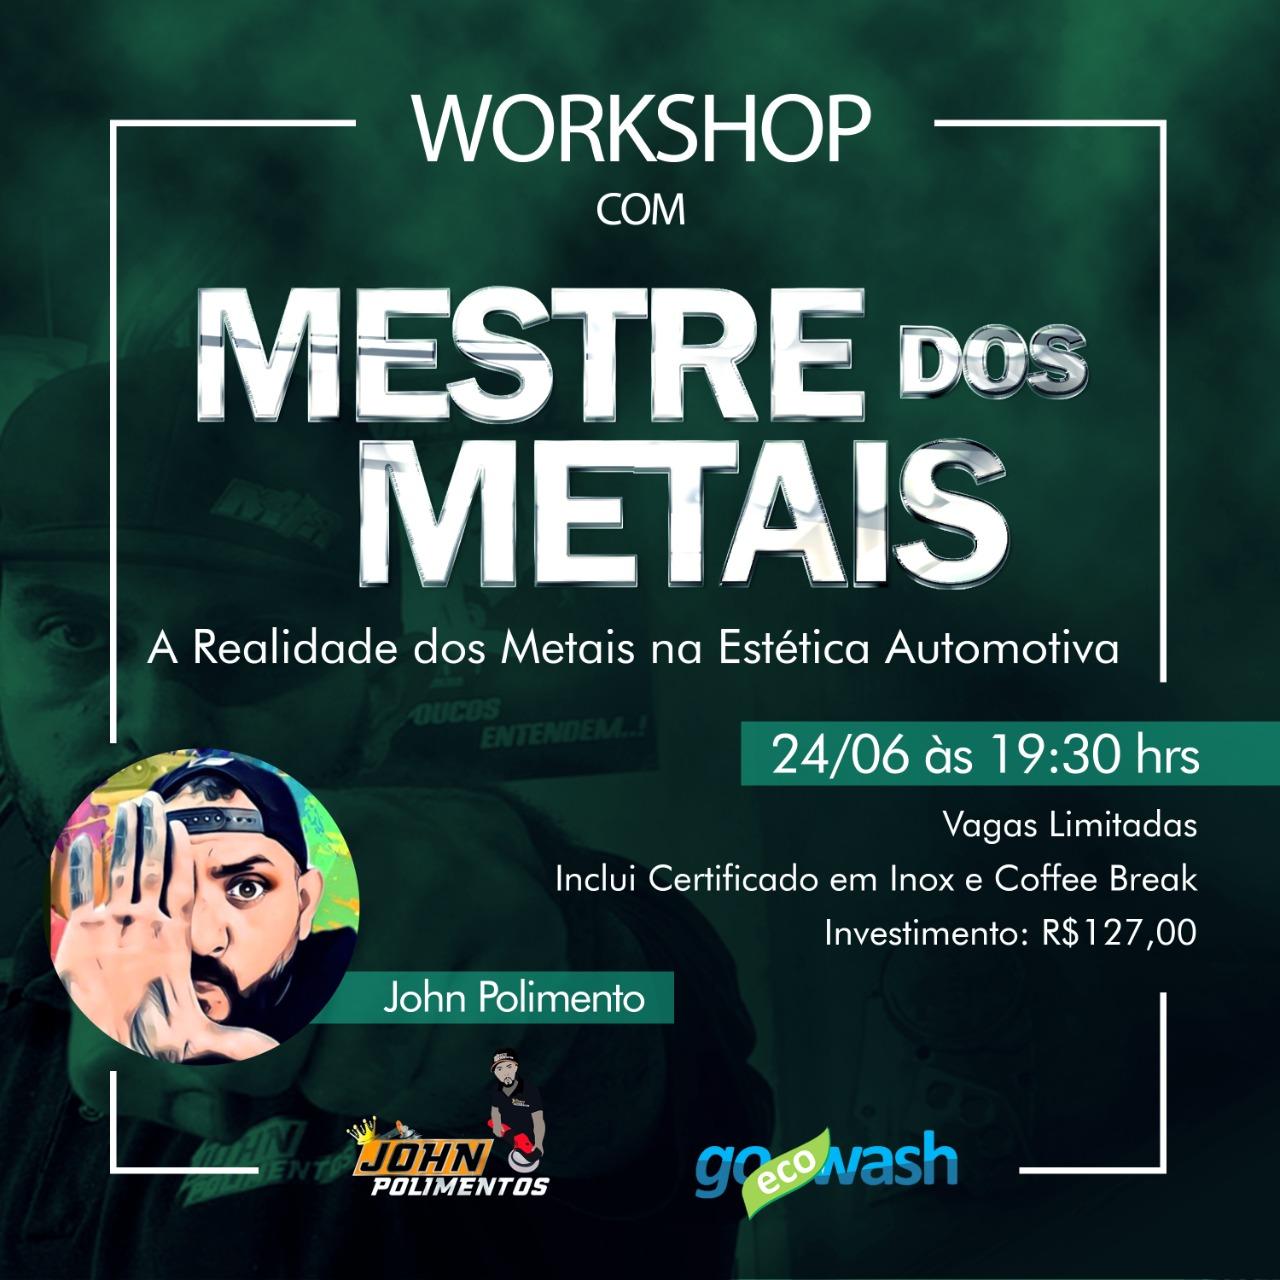 Workshop Mestre dos Metais - John Polimentos  - Loja Go Eco Wash